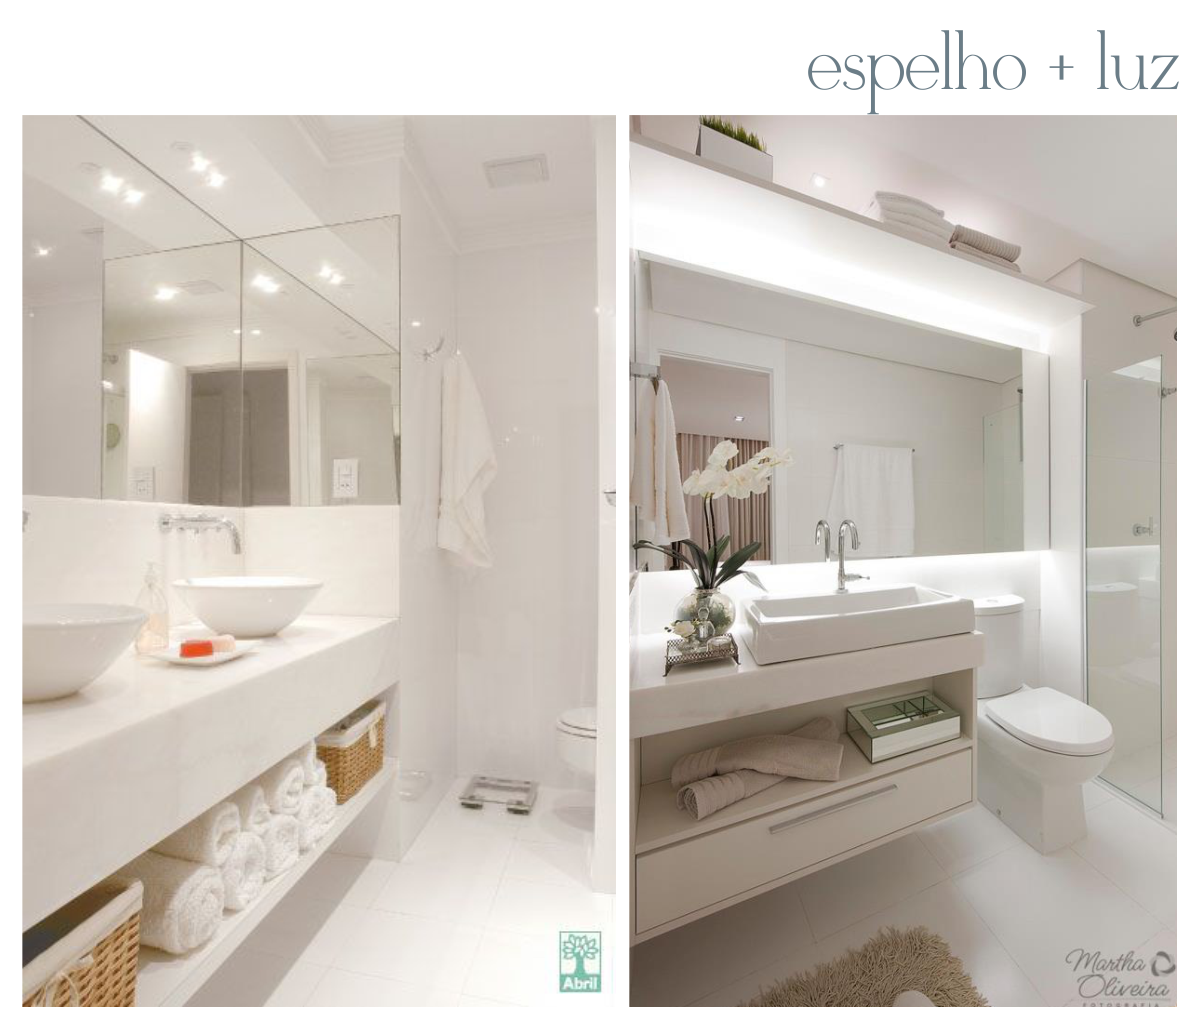 Pin Pin Banheiro Apartamento Pequeno Decorado Photo Pelautscom On on  #975734 1200 1030